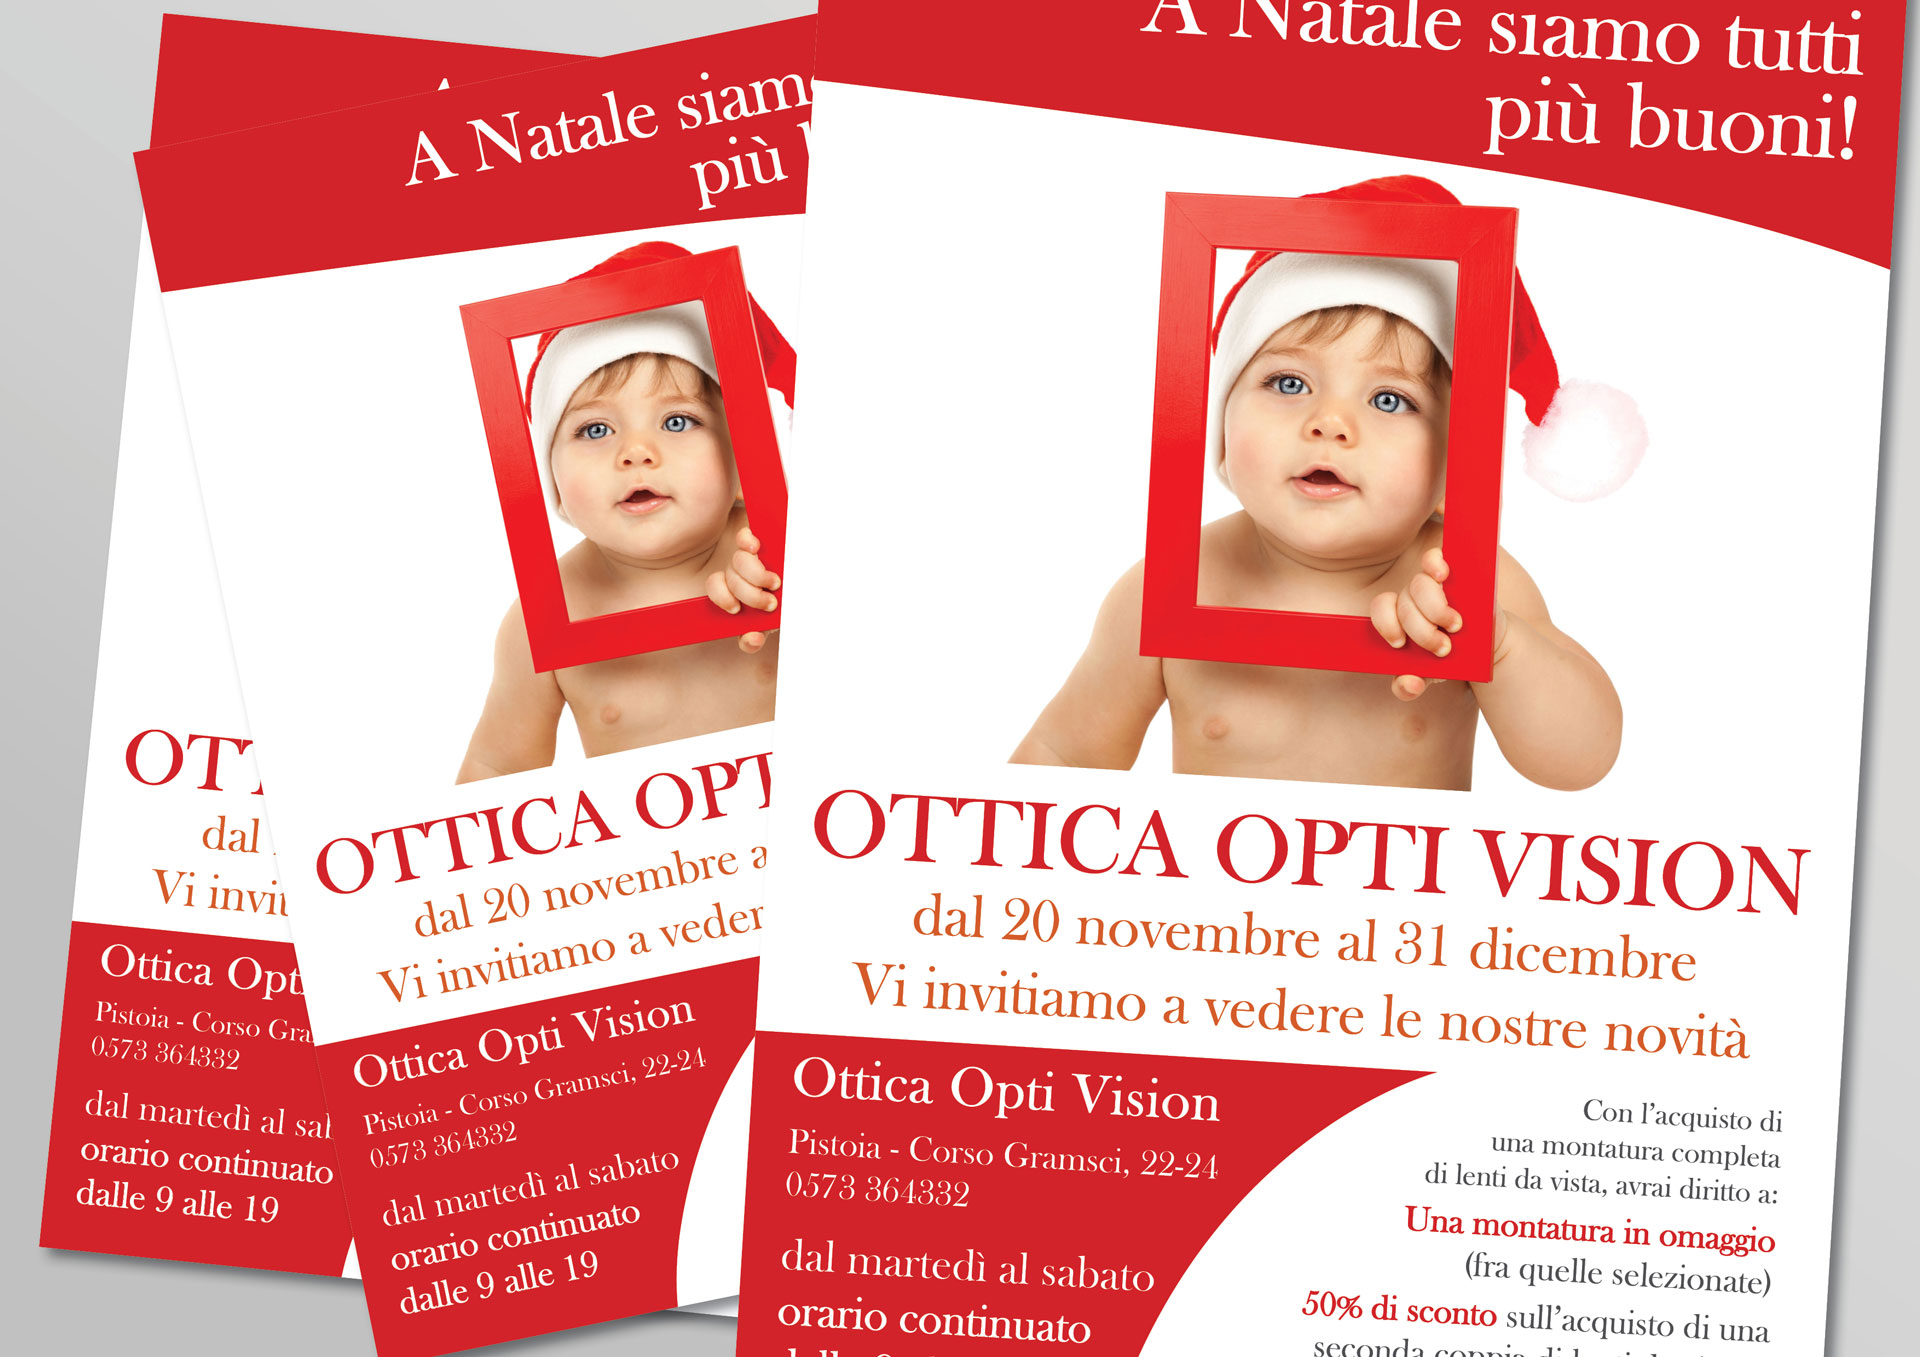 ottica-opti-vision